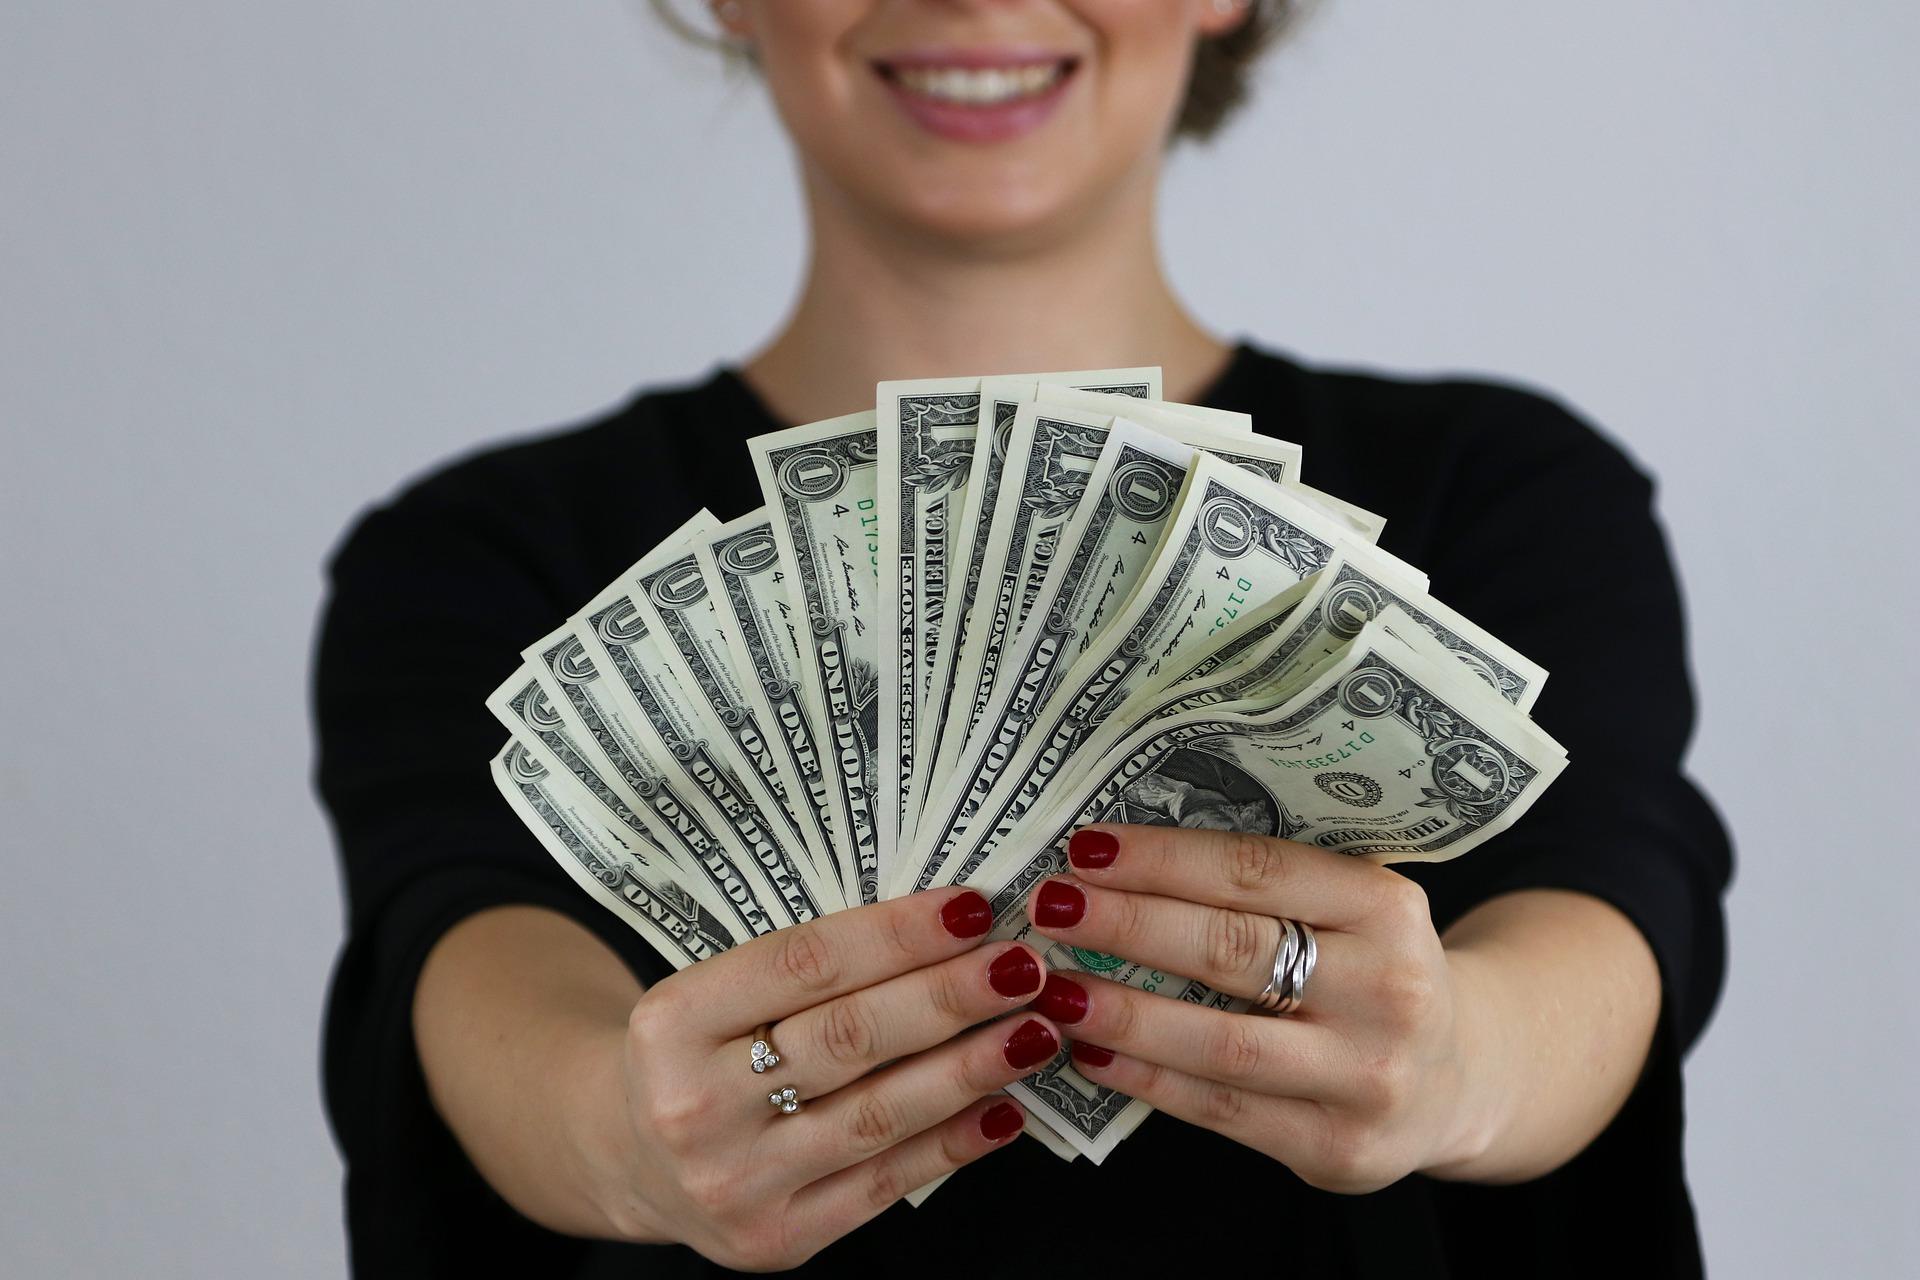 New Survey: Majority of Americans Favor Paper Money over Digital Money